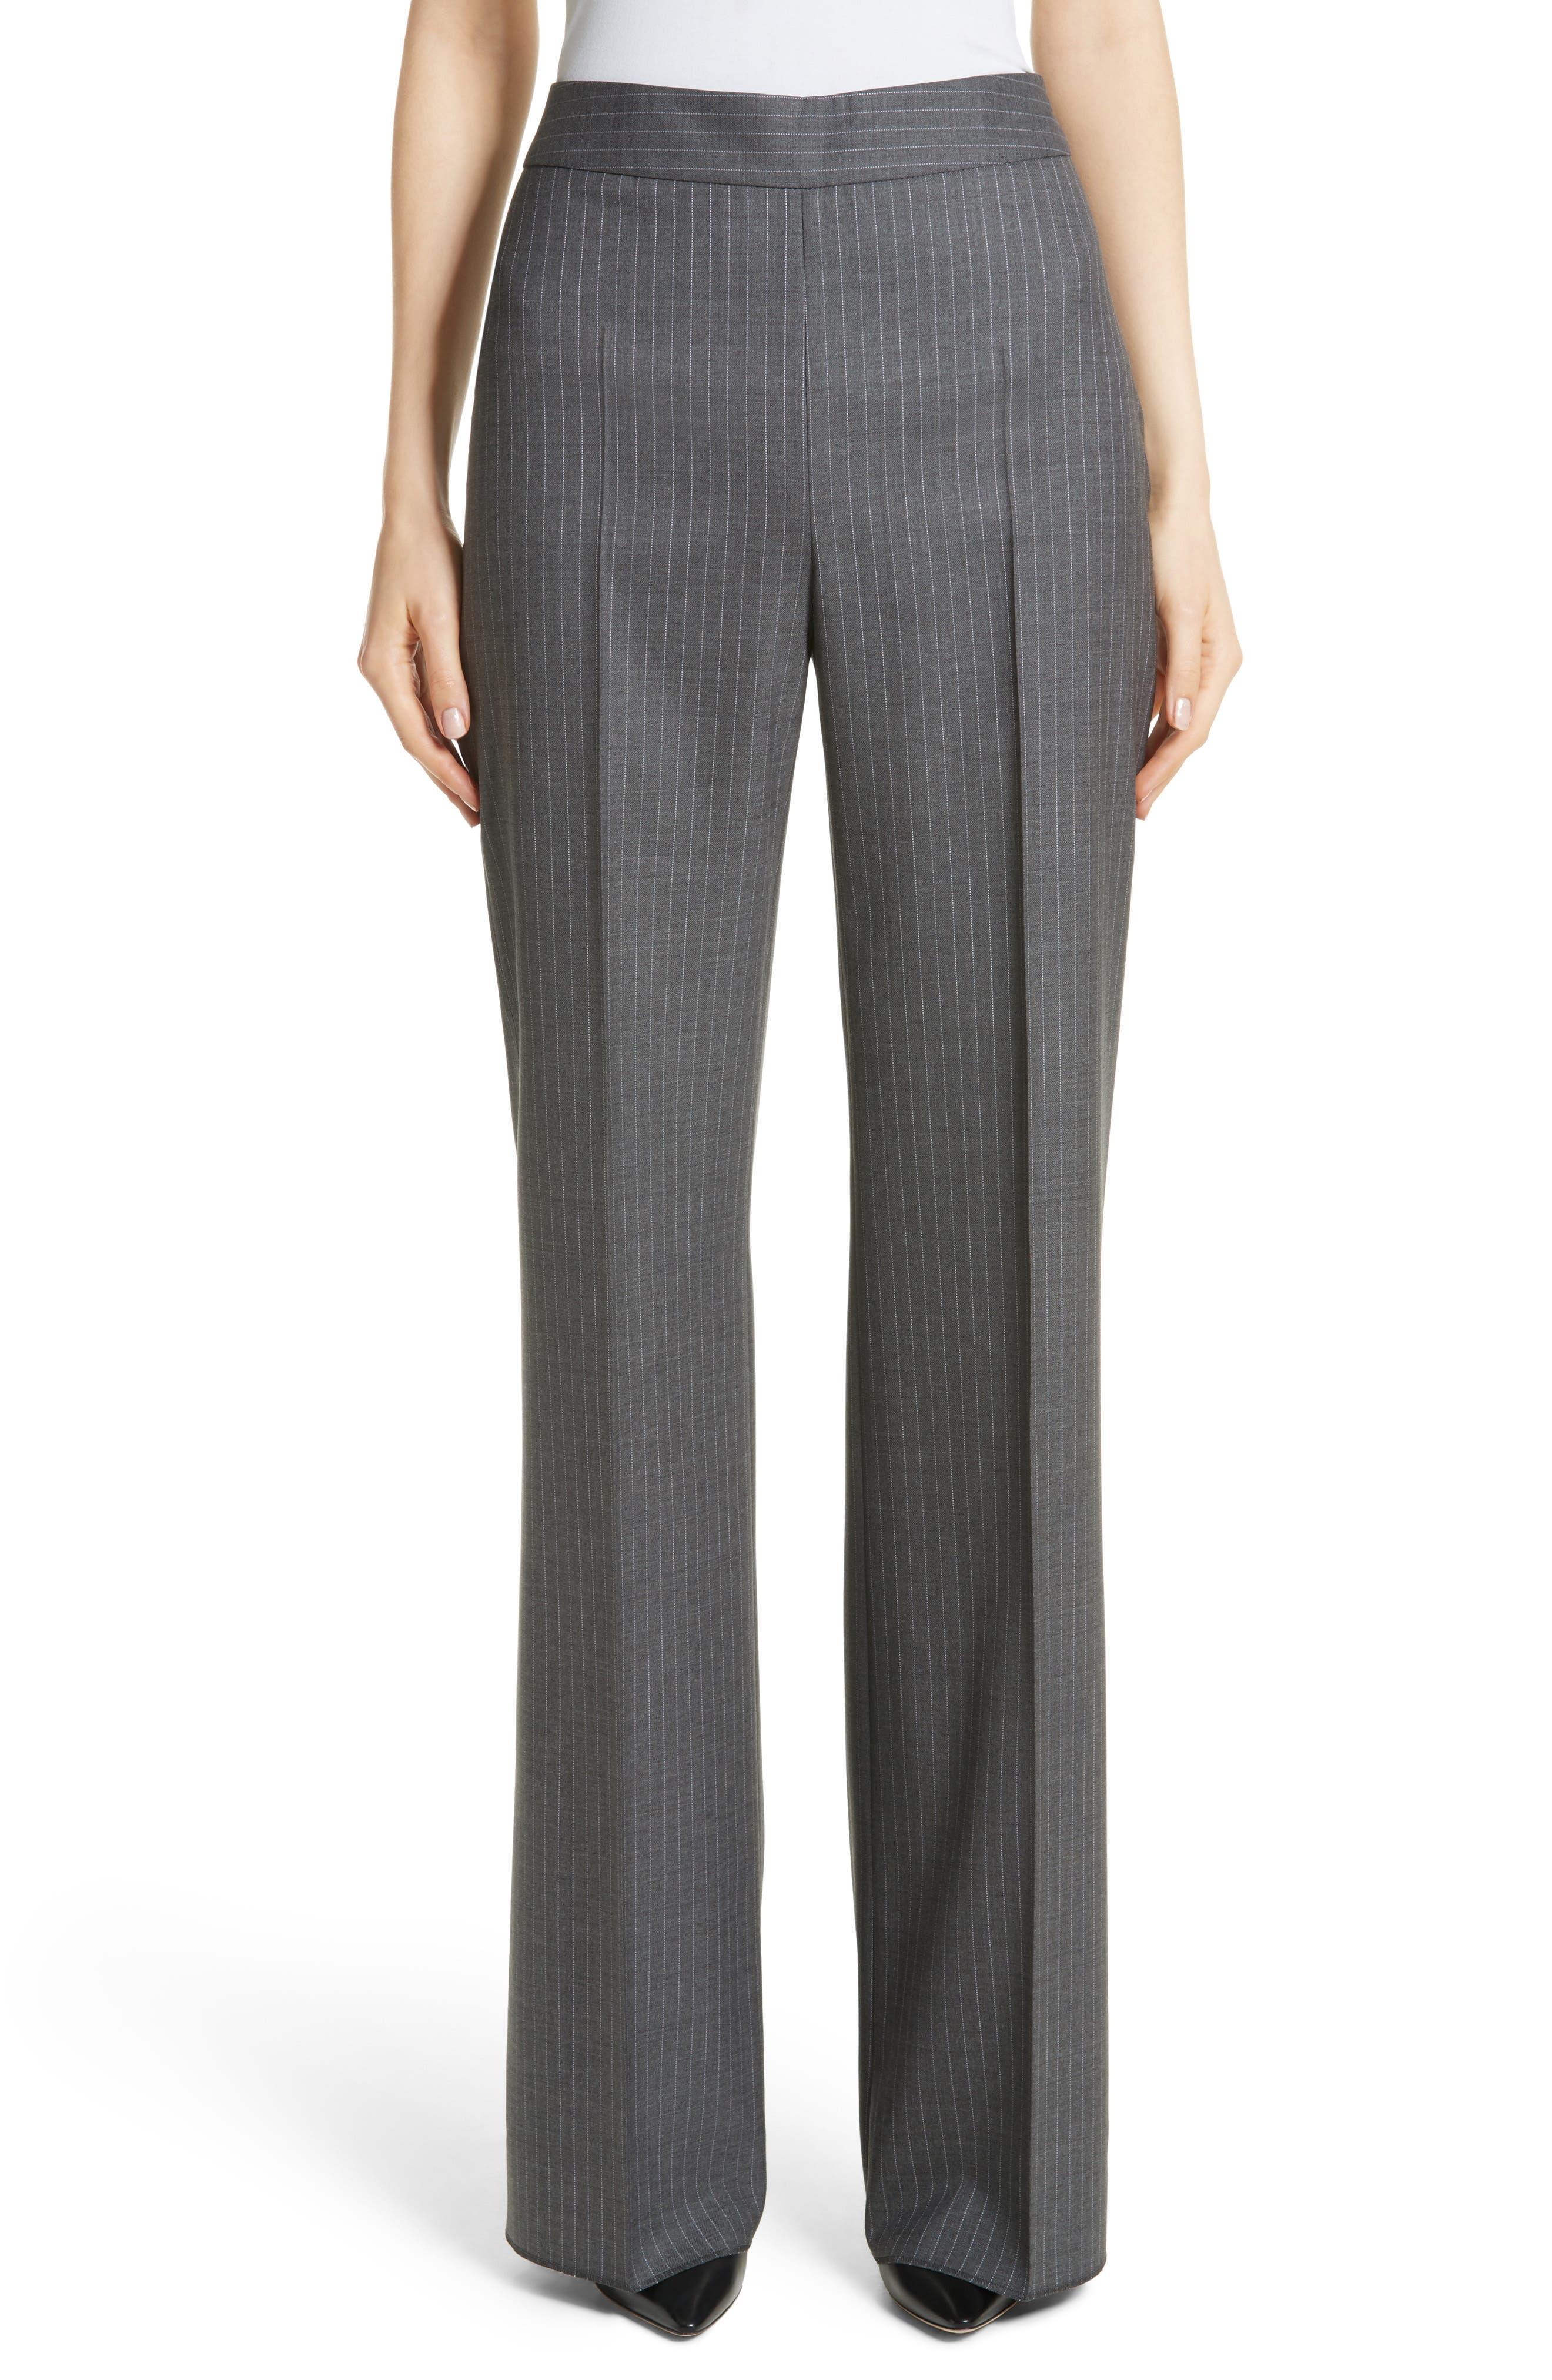 Garibo Stretch Wool Pinstripe Pants,                             Main thumbnail 1, color,